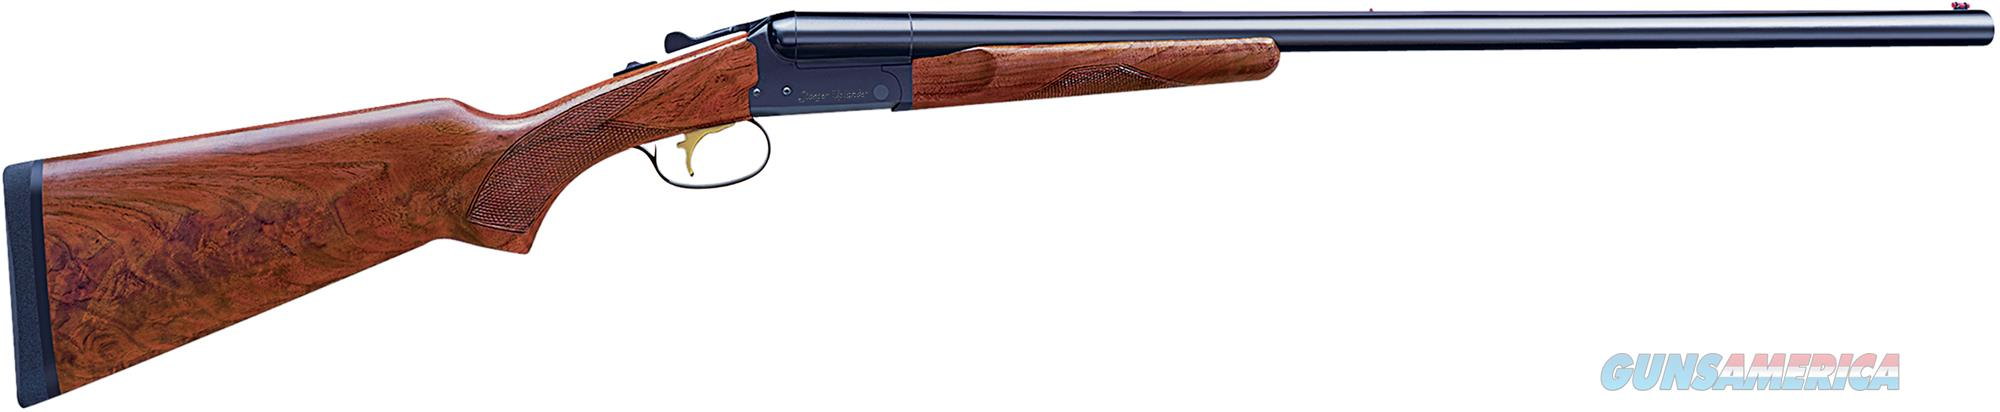 "Stoeger Uplander Supreme 20 Ga 26"" BBL 31115 NIB  Guns > Shotguns > Stoeger Shotguns"